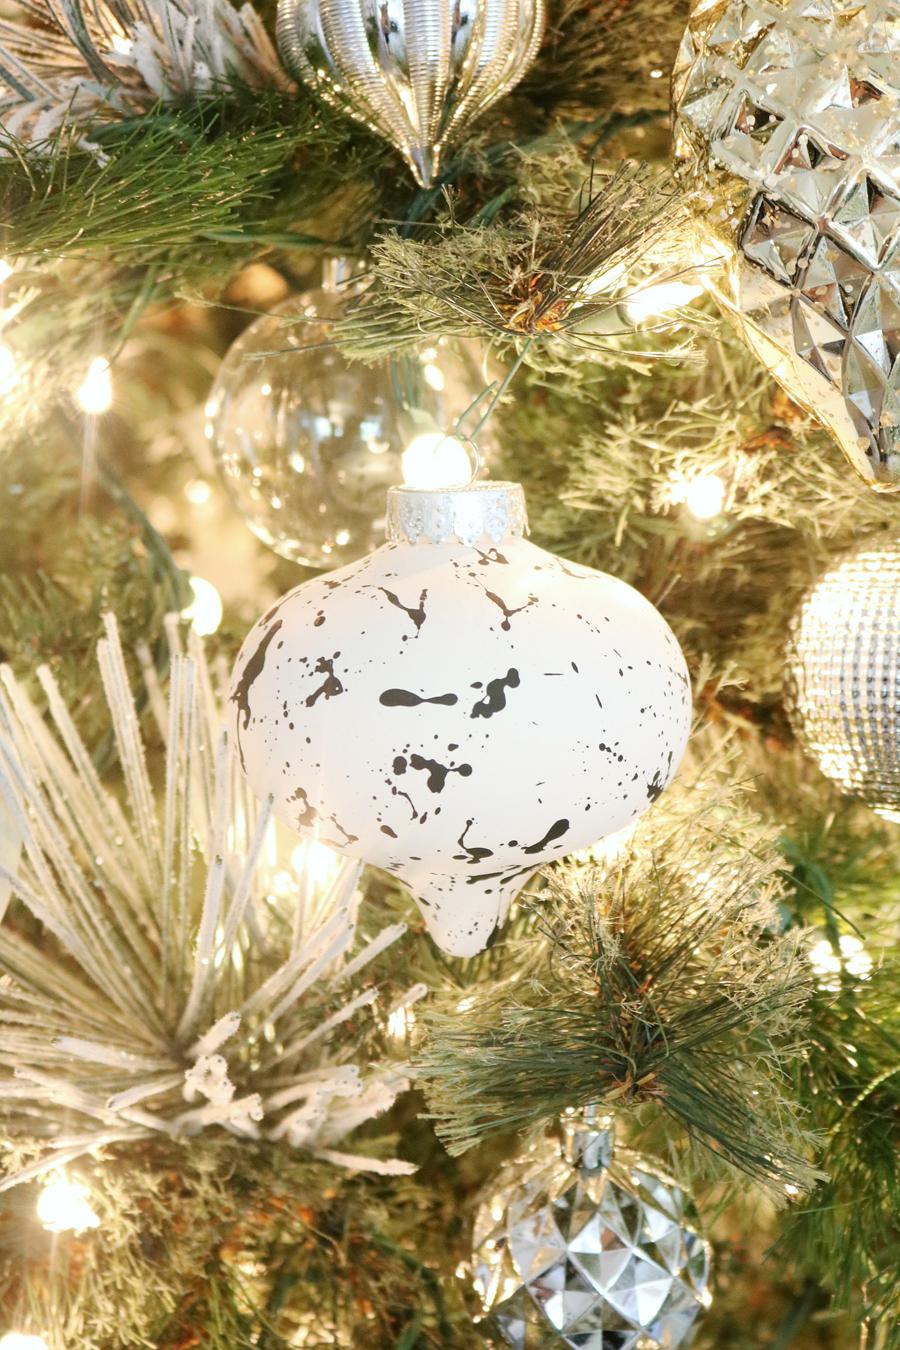 Black & White Modern Snowflake Christmas Tree Decor - Splatter paint ordinary plain ornaments.